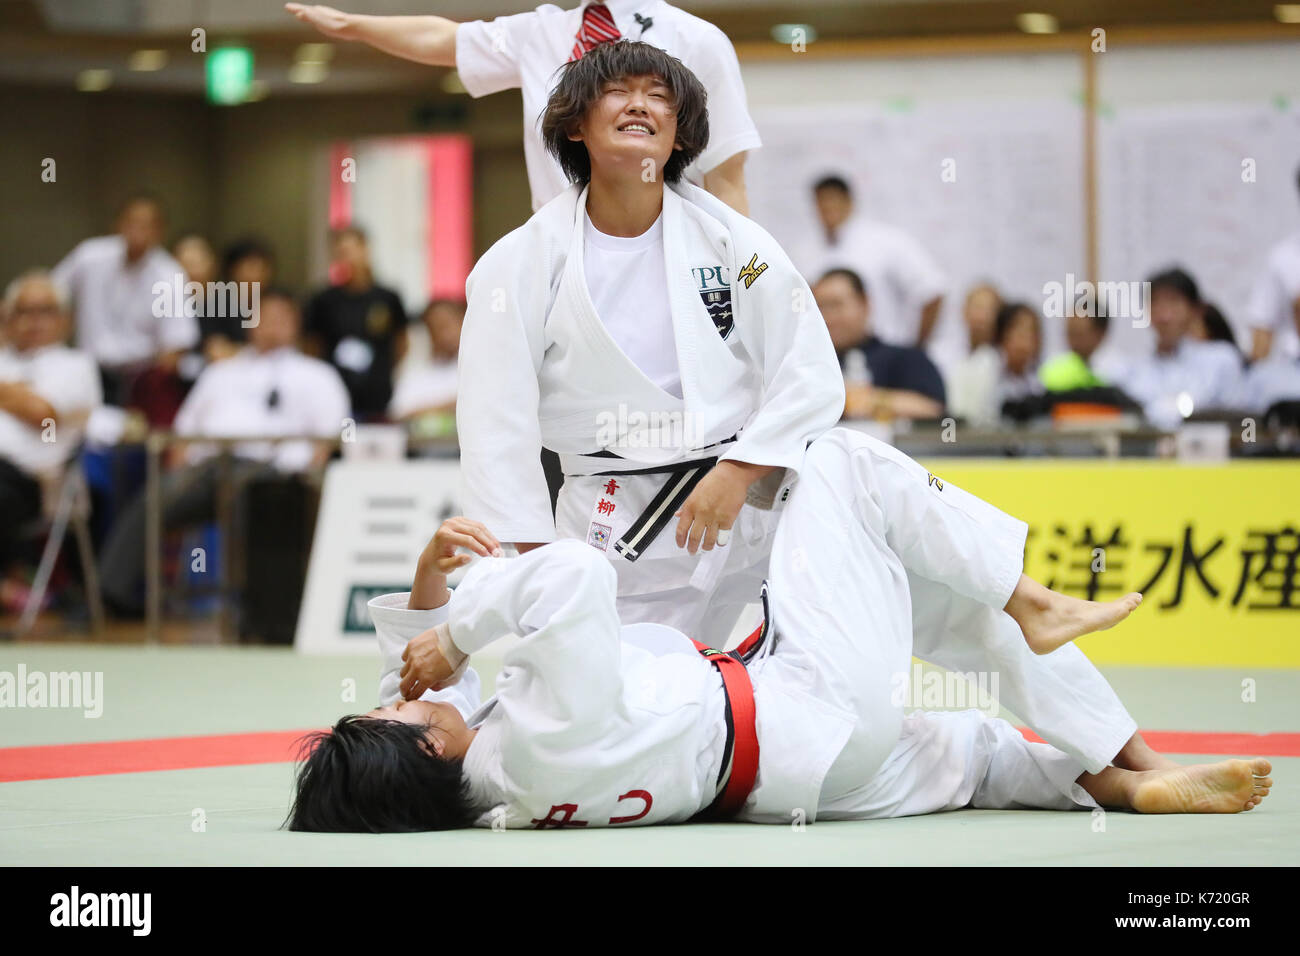 Saitama Kenritsu Budokan Saitama Japan 10th Sep 2017 U to D